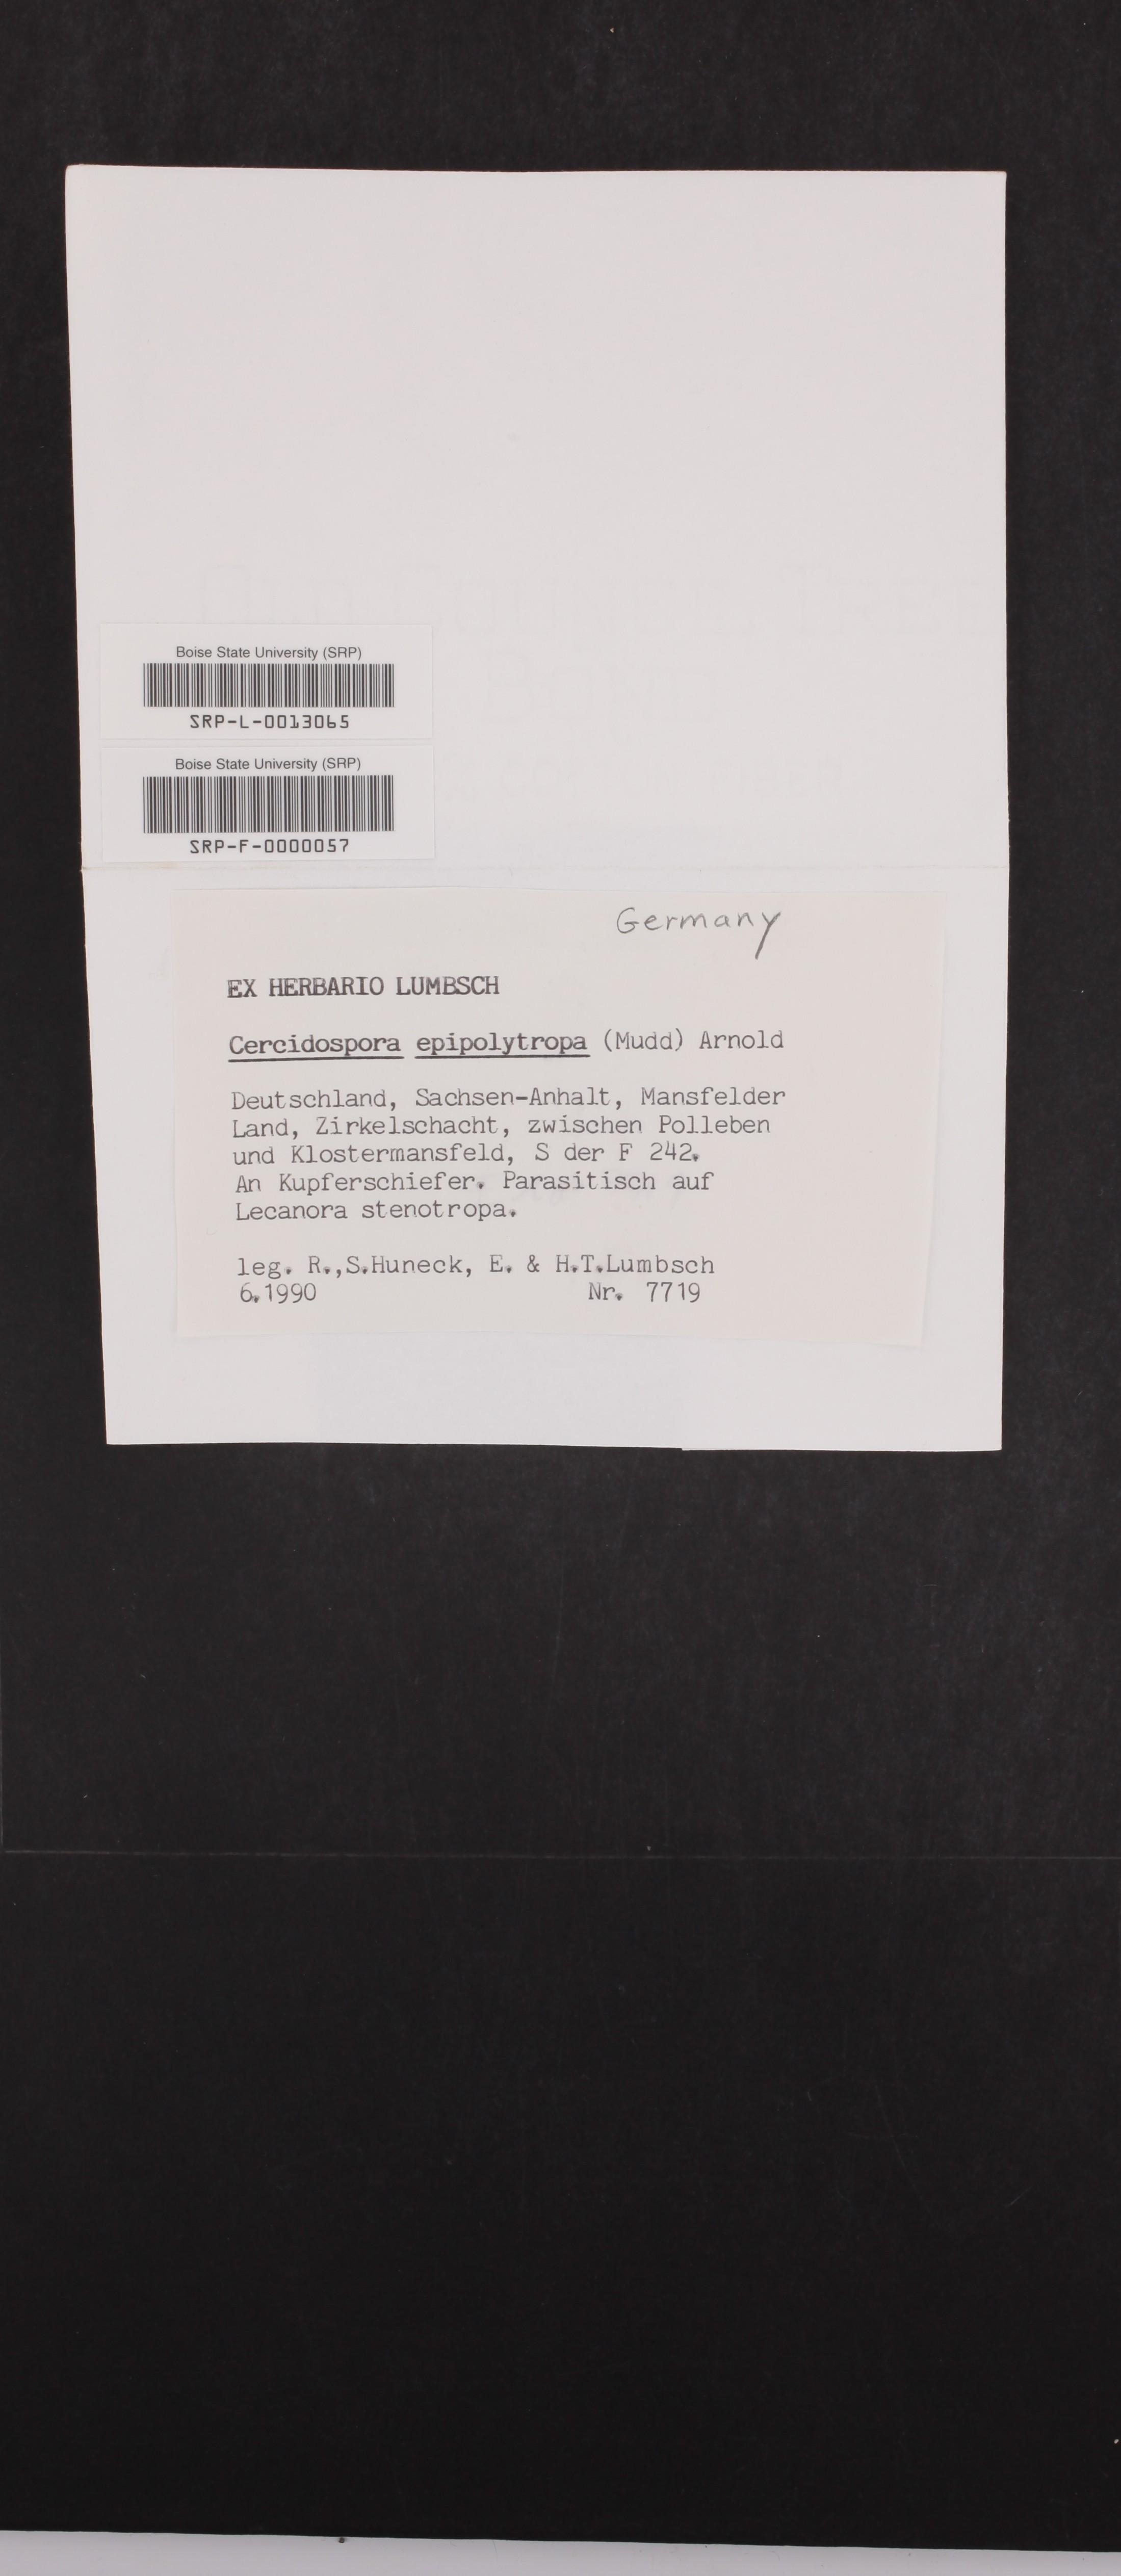 Cercidospora epipolytropa image